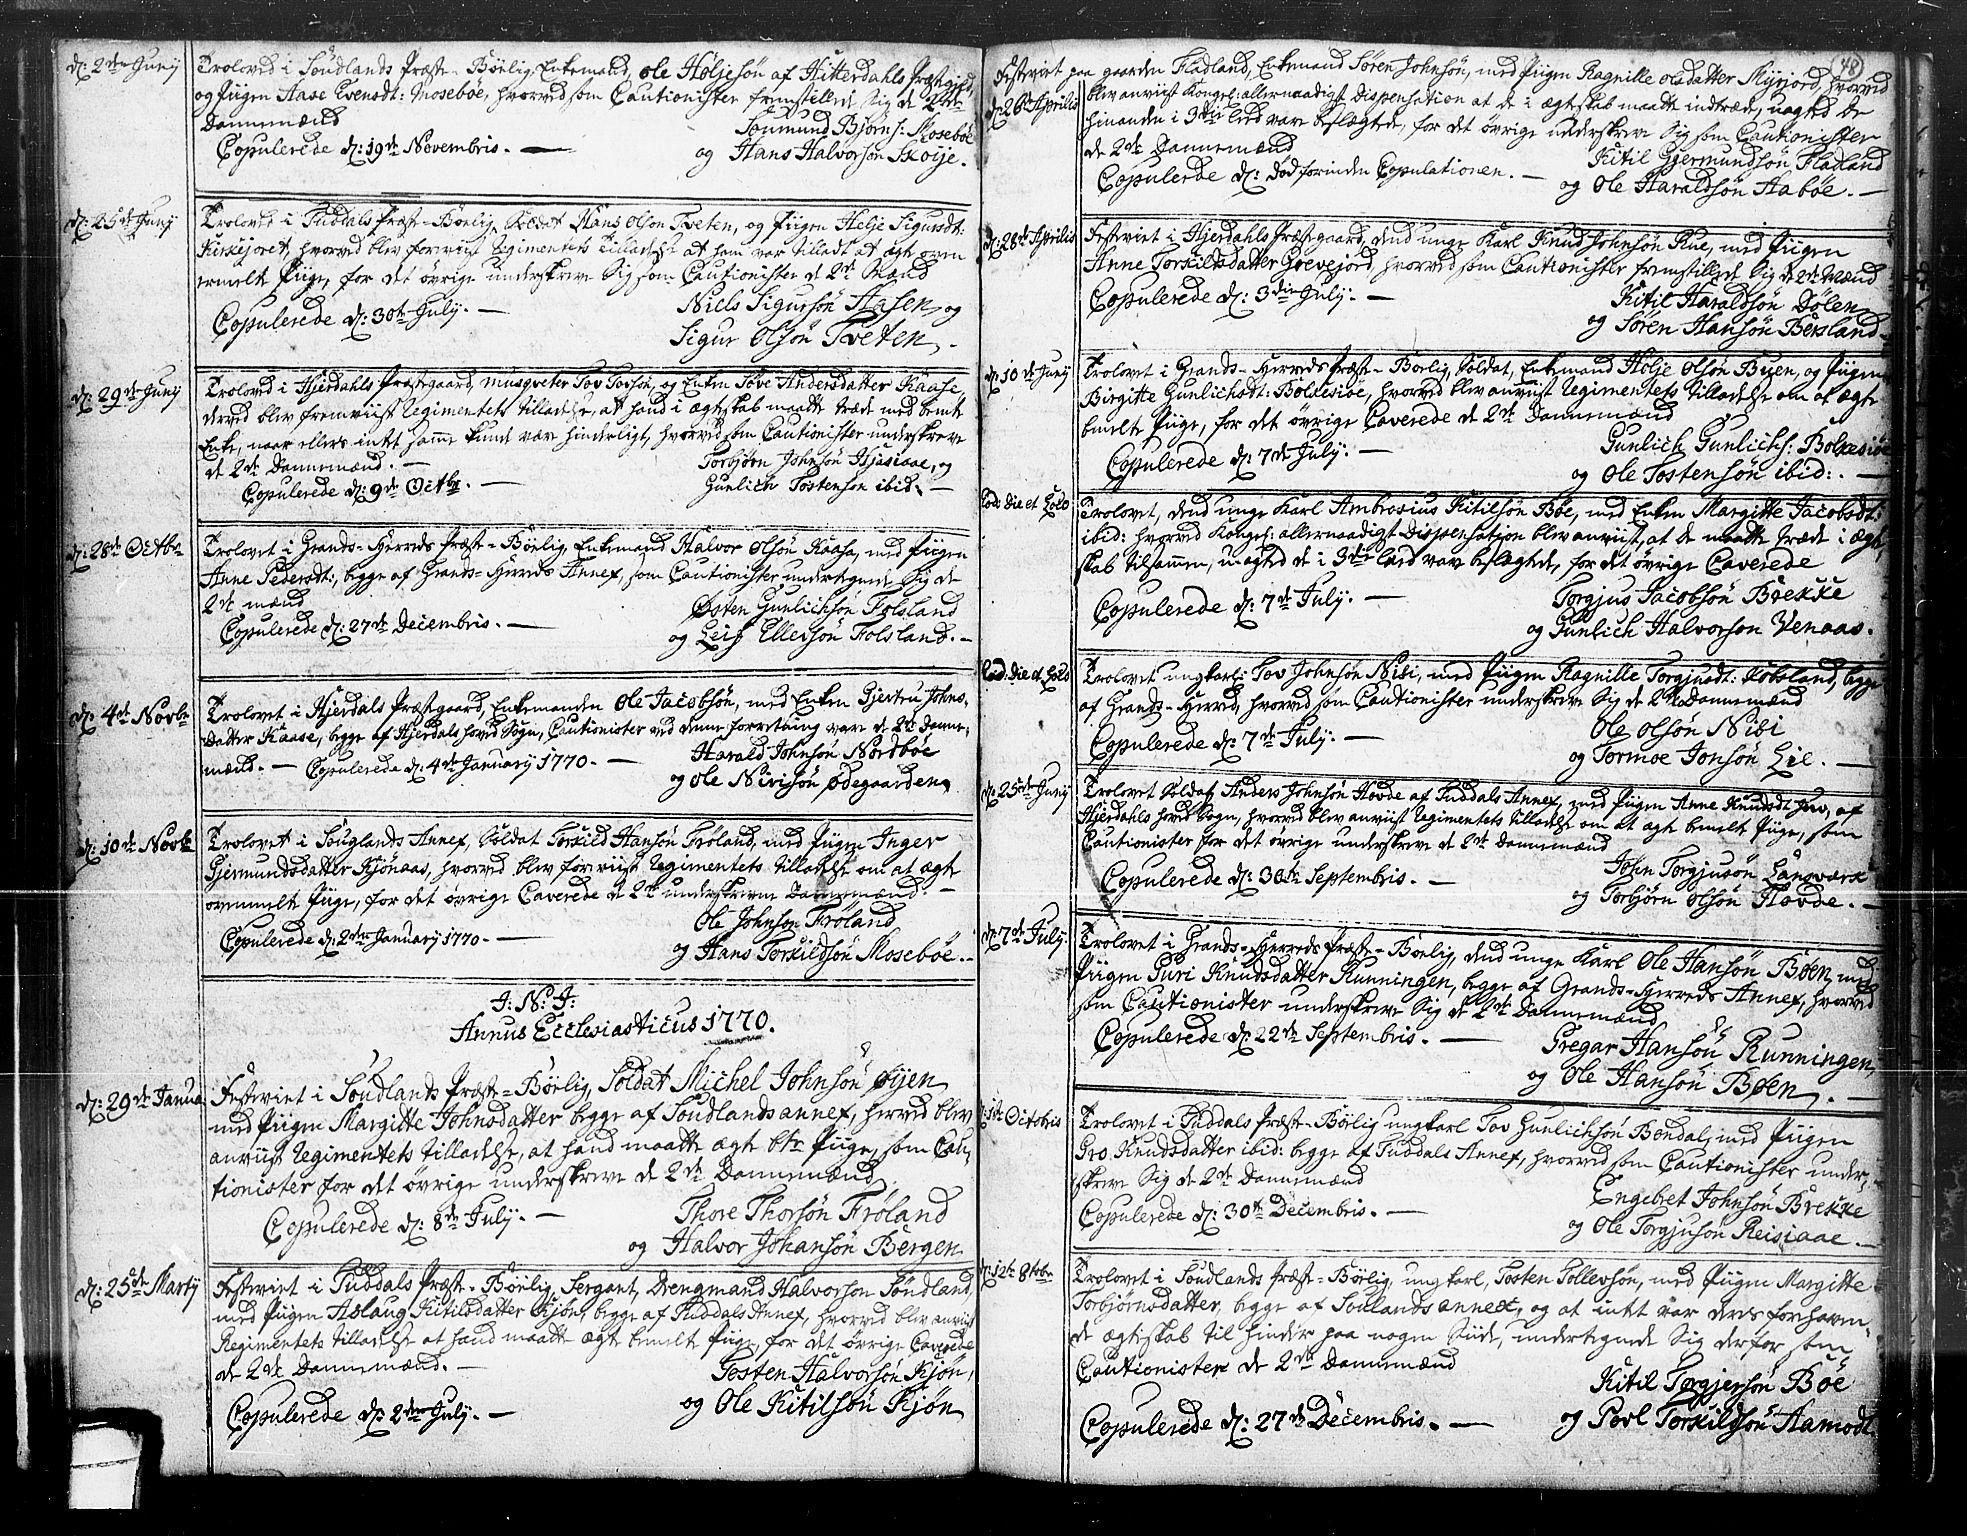 SAKO, Hjartdal kirkebøker, F/Fa/L0004: Ministerialbok nr. I 4, 1727-1795, s. 48